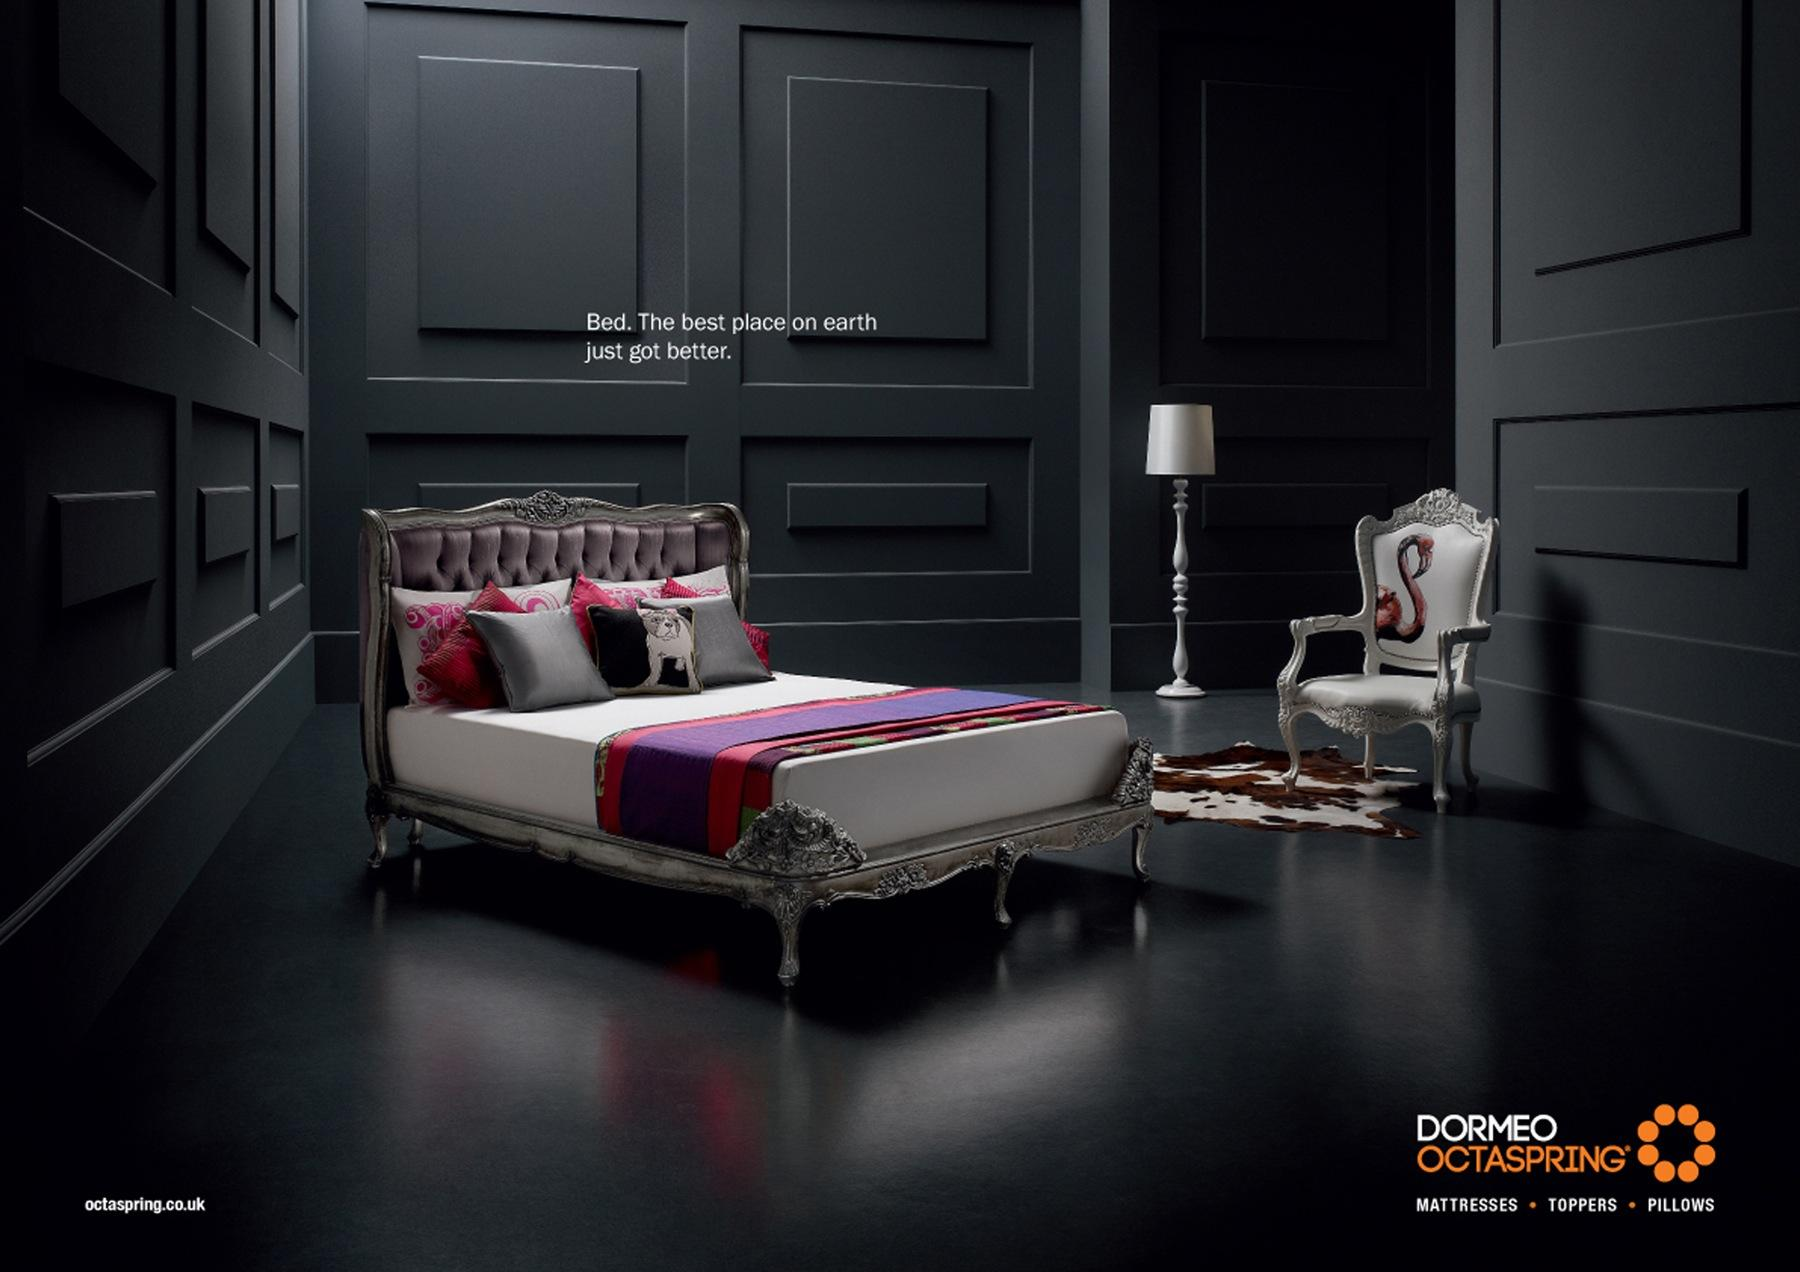 Dormeo Print Ad -  Bed, 1